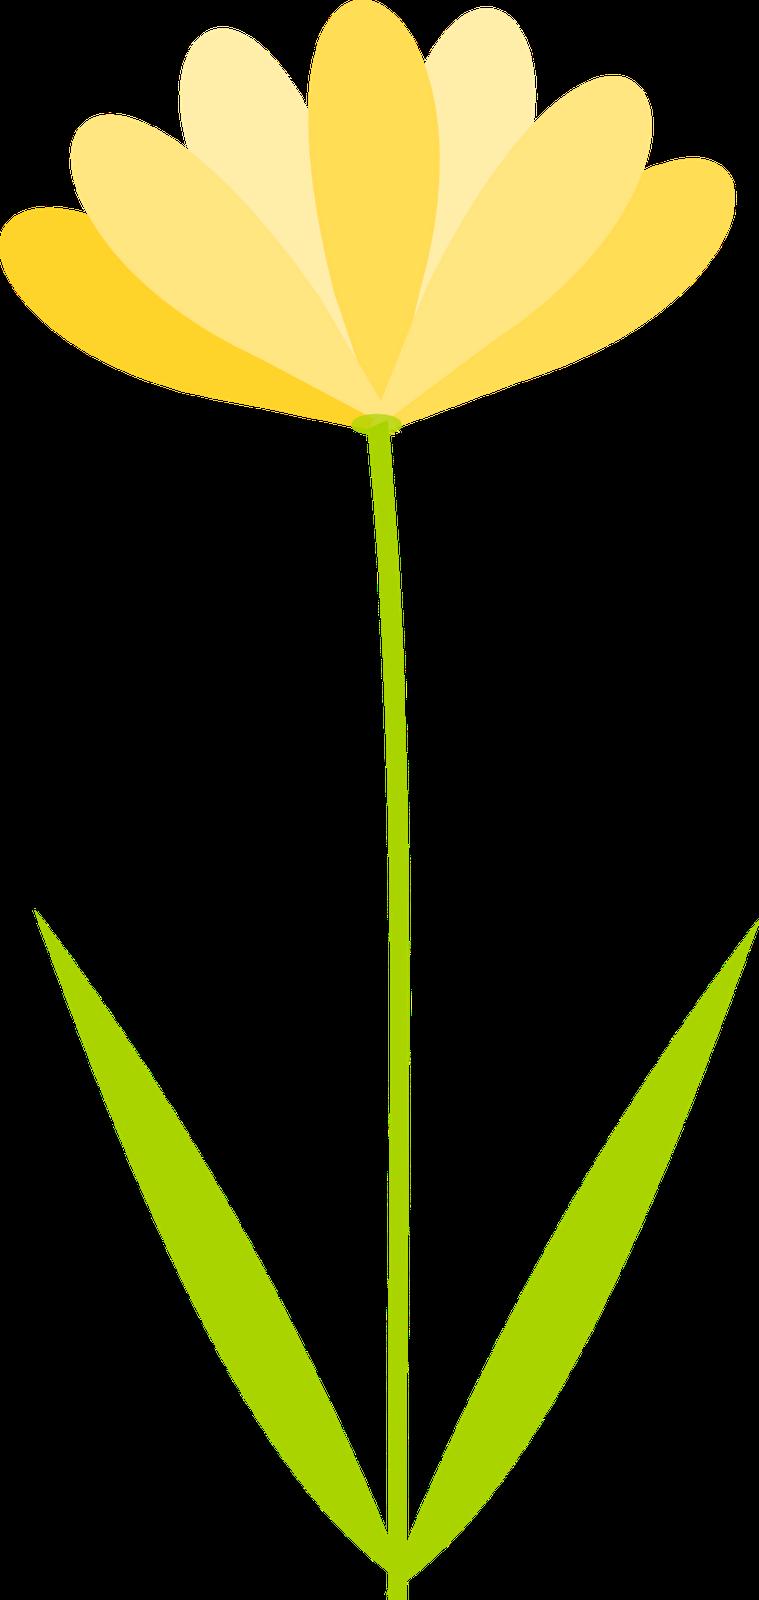 Clipart flowers transparent background, Clipart flowers